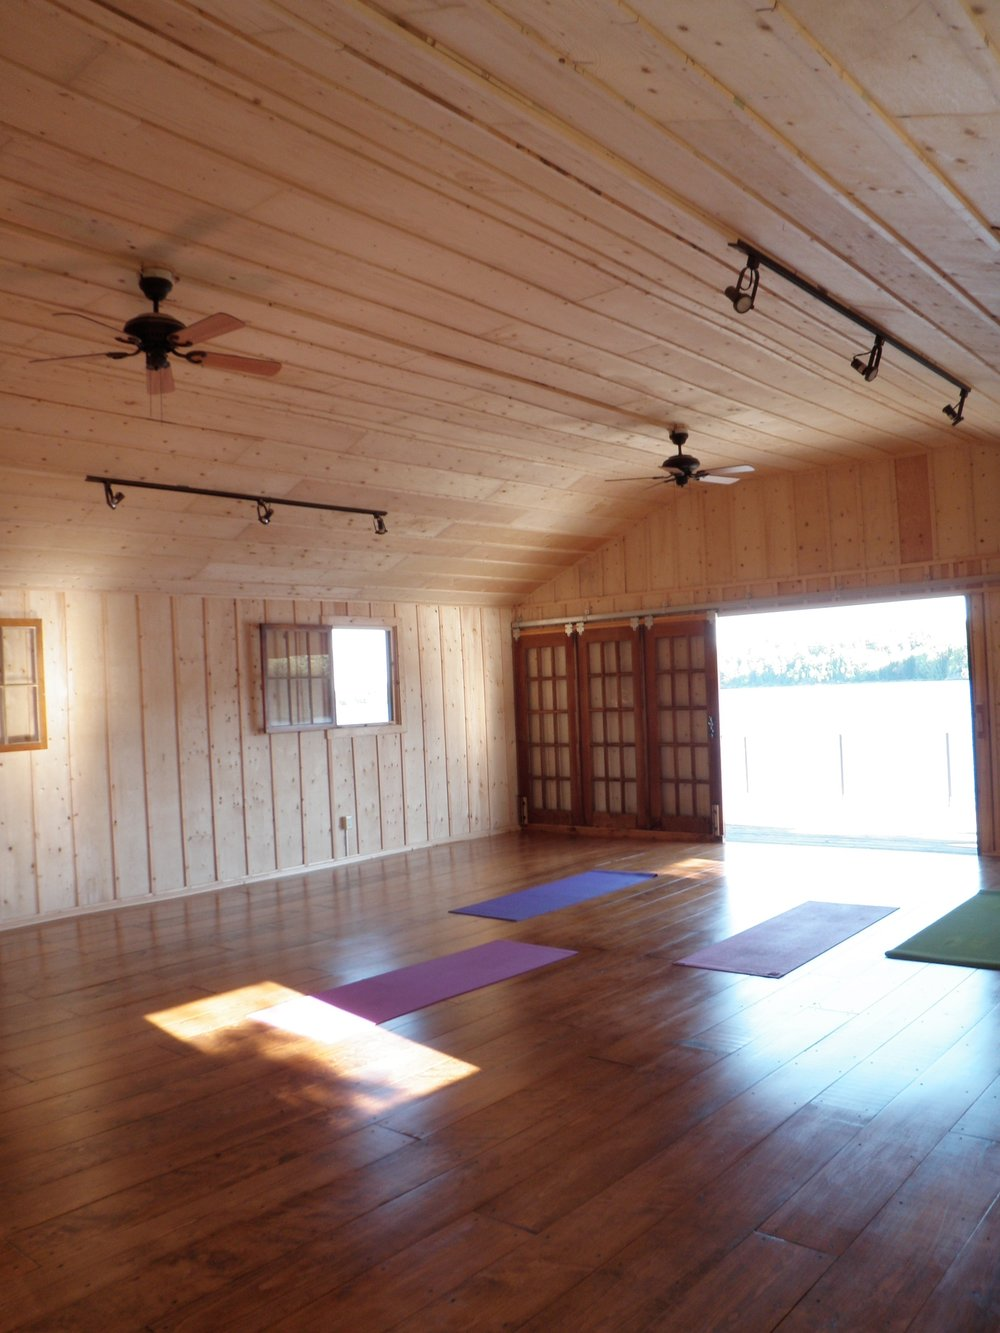 The Boat House - Dedicated Yoga Studio